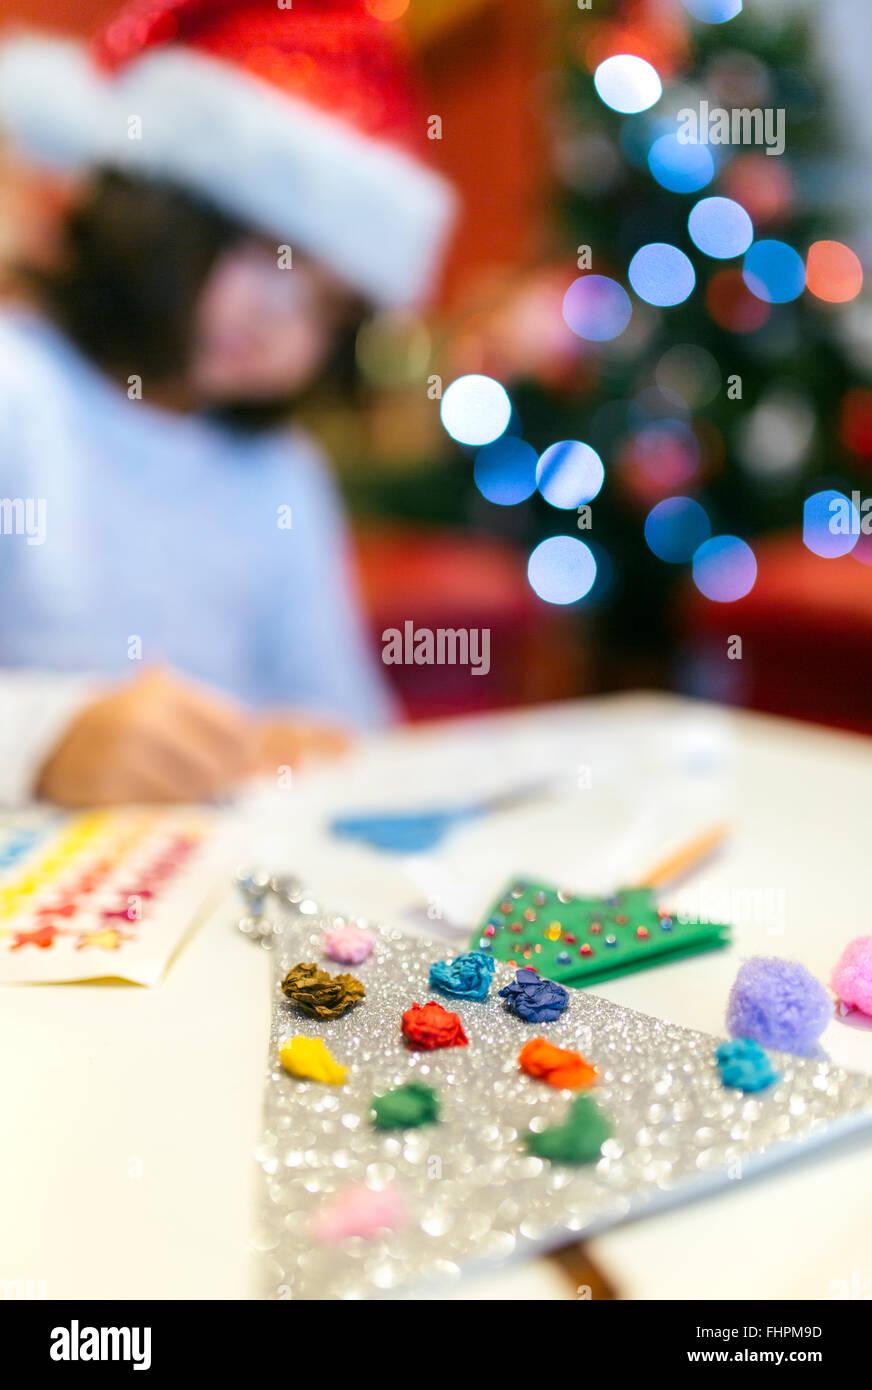 Lttle girl tinkering Christmas decoration, close-up - Stock Image